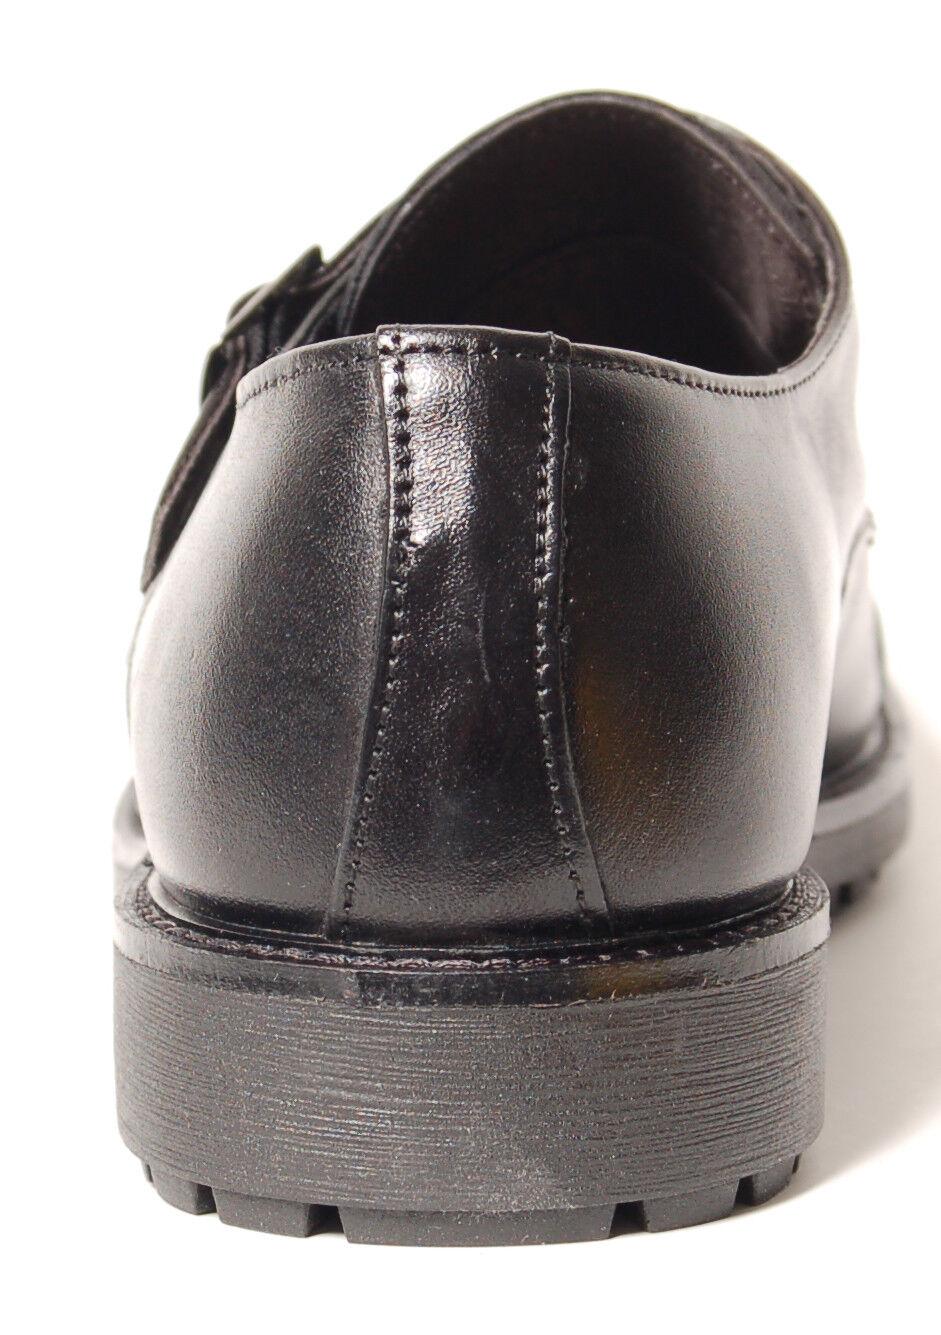 Acc   fabricado a mano mano mano   italiana hebillas zapato   Monk monkstrap   9501 435283